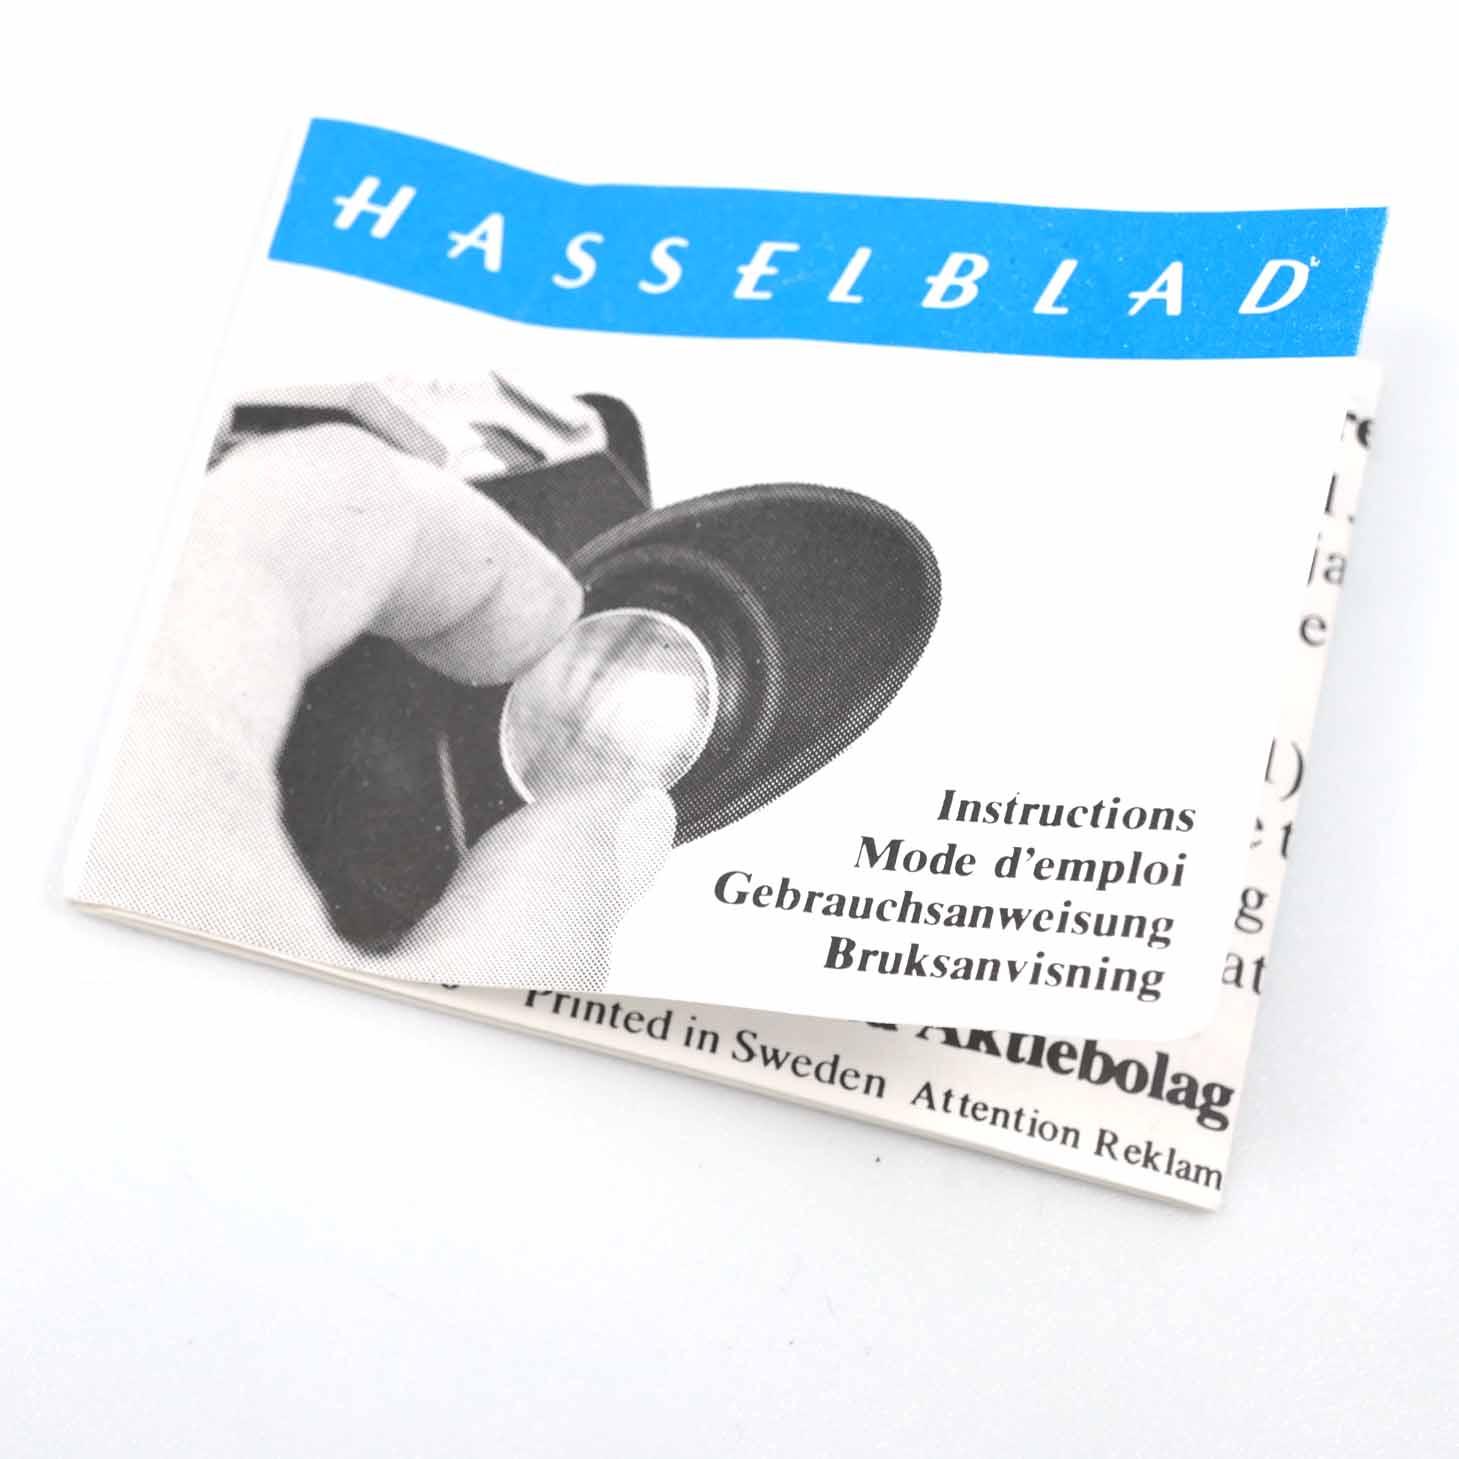 clean-cameras-Hasselblad-52140-02